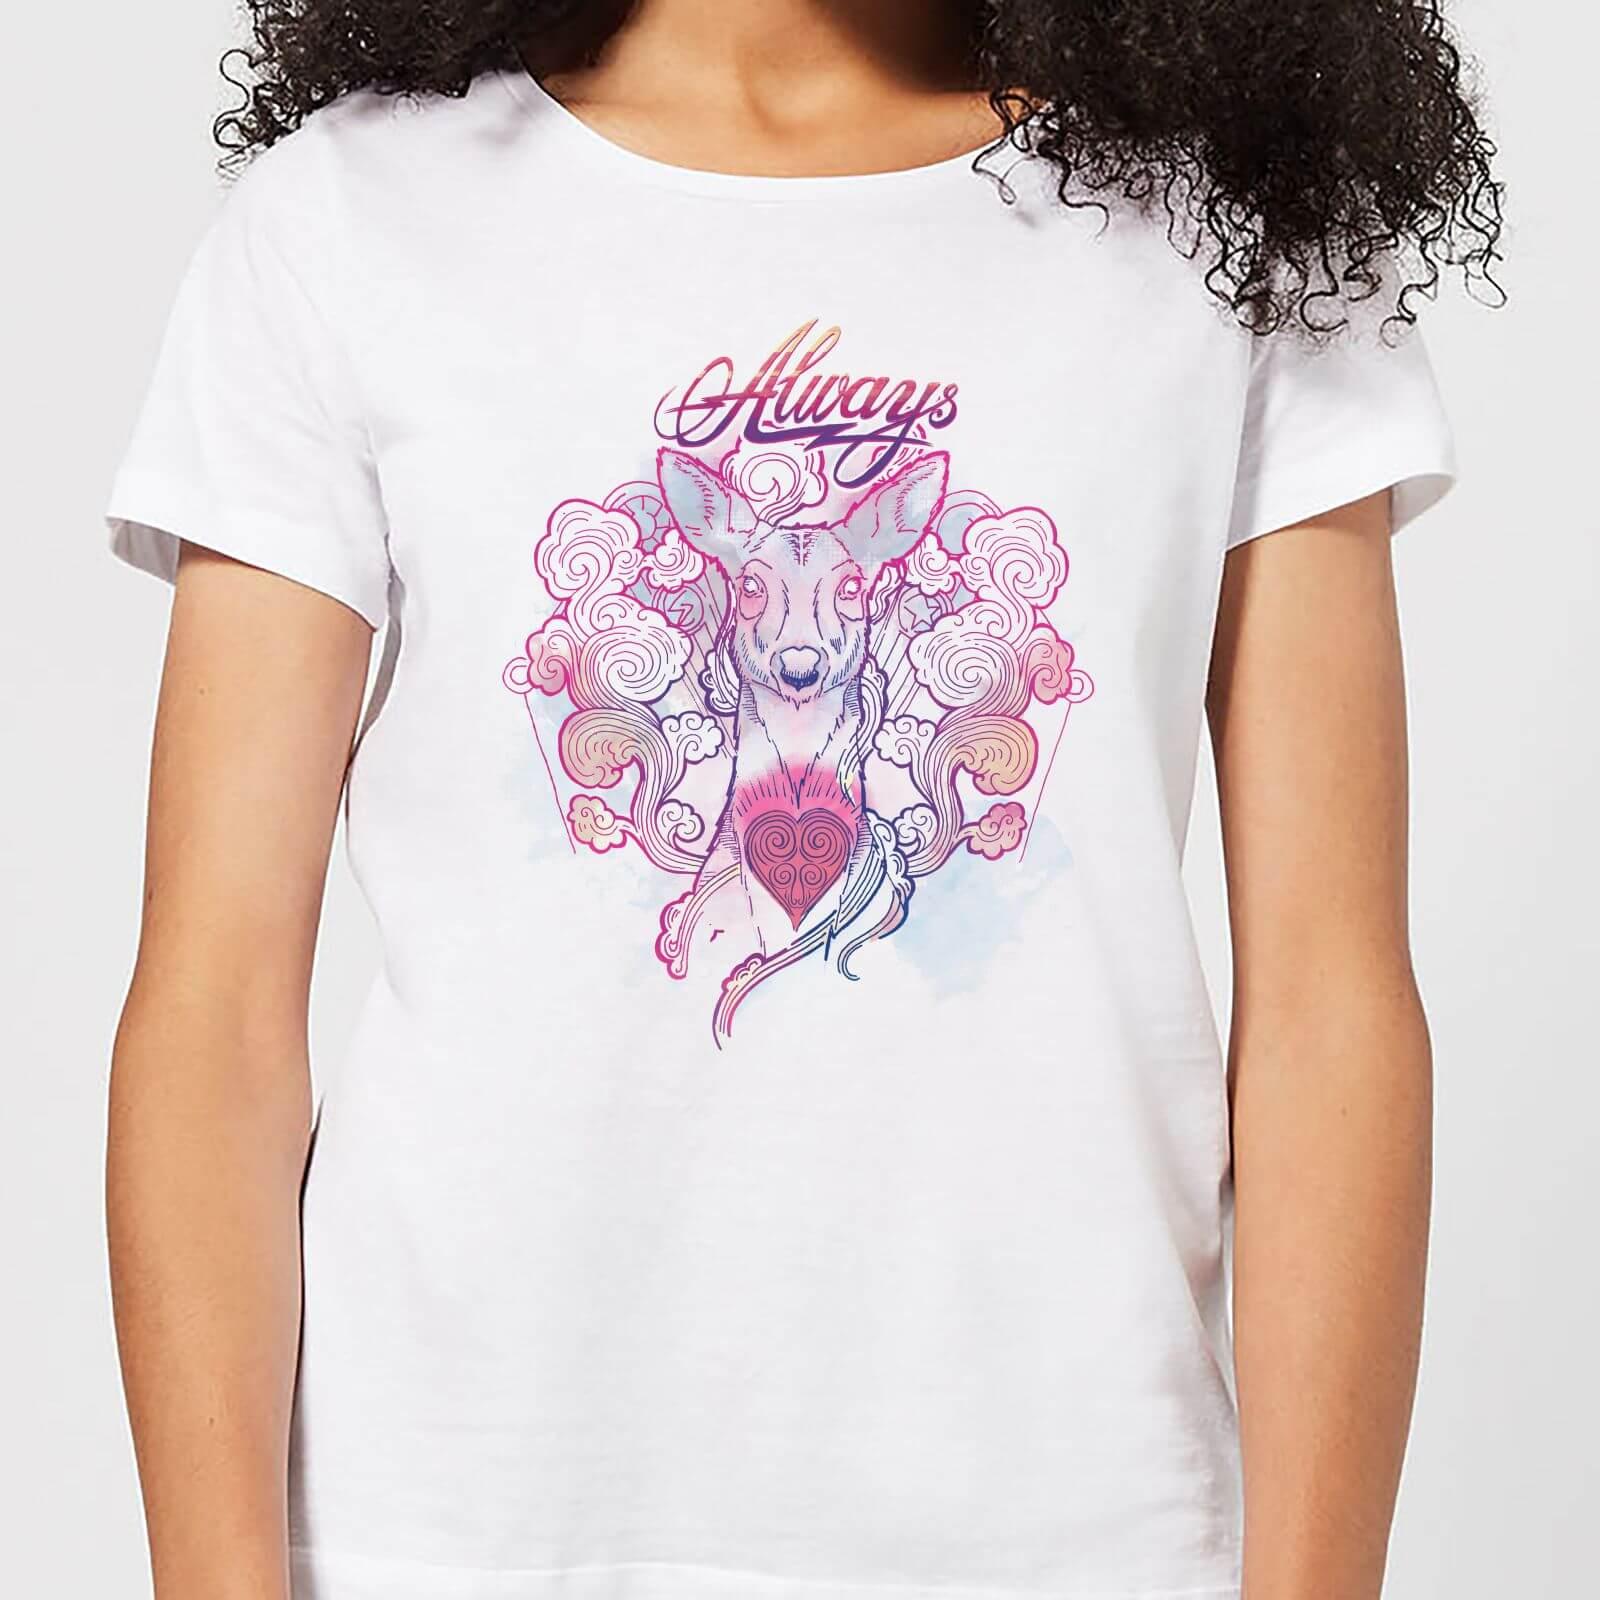 5a714b1c1 Harry Potter Always Women's T-Shirt - White Clothing | Zavvi